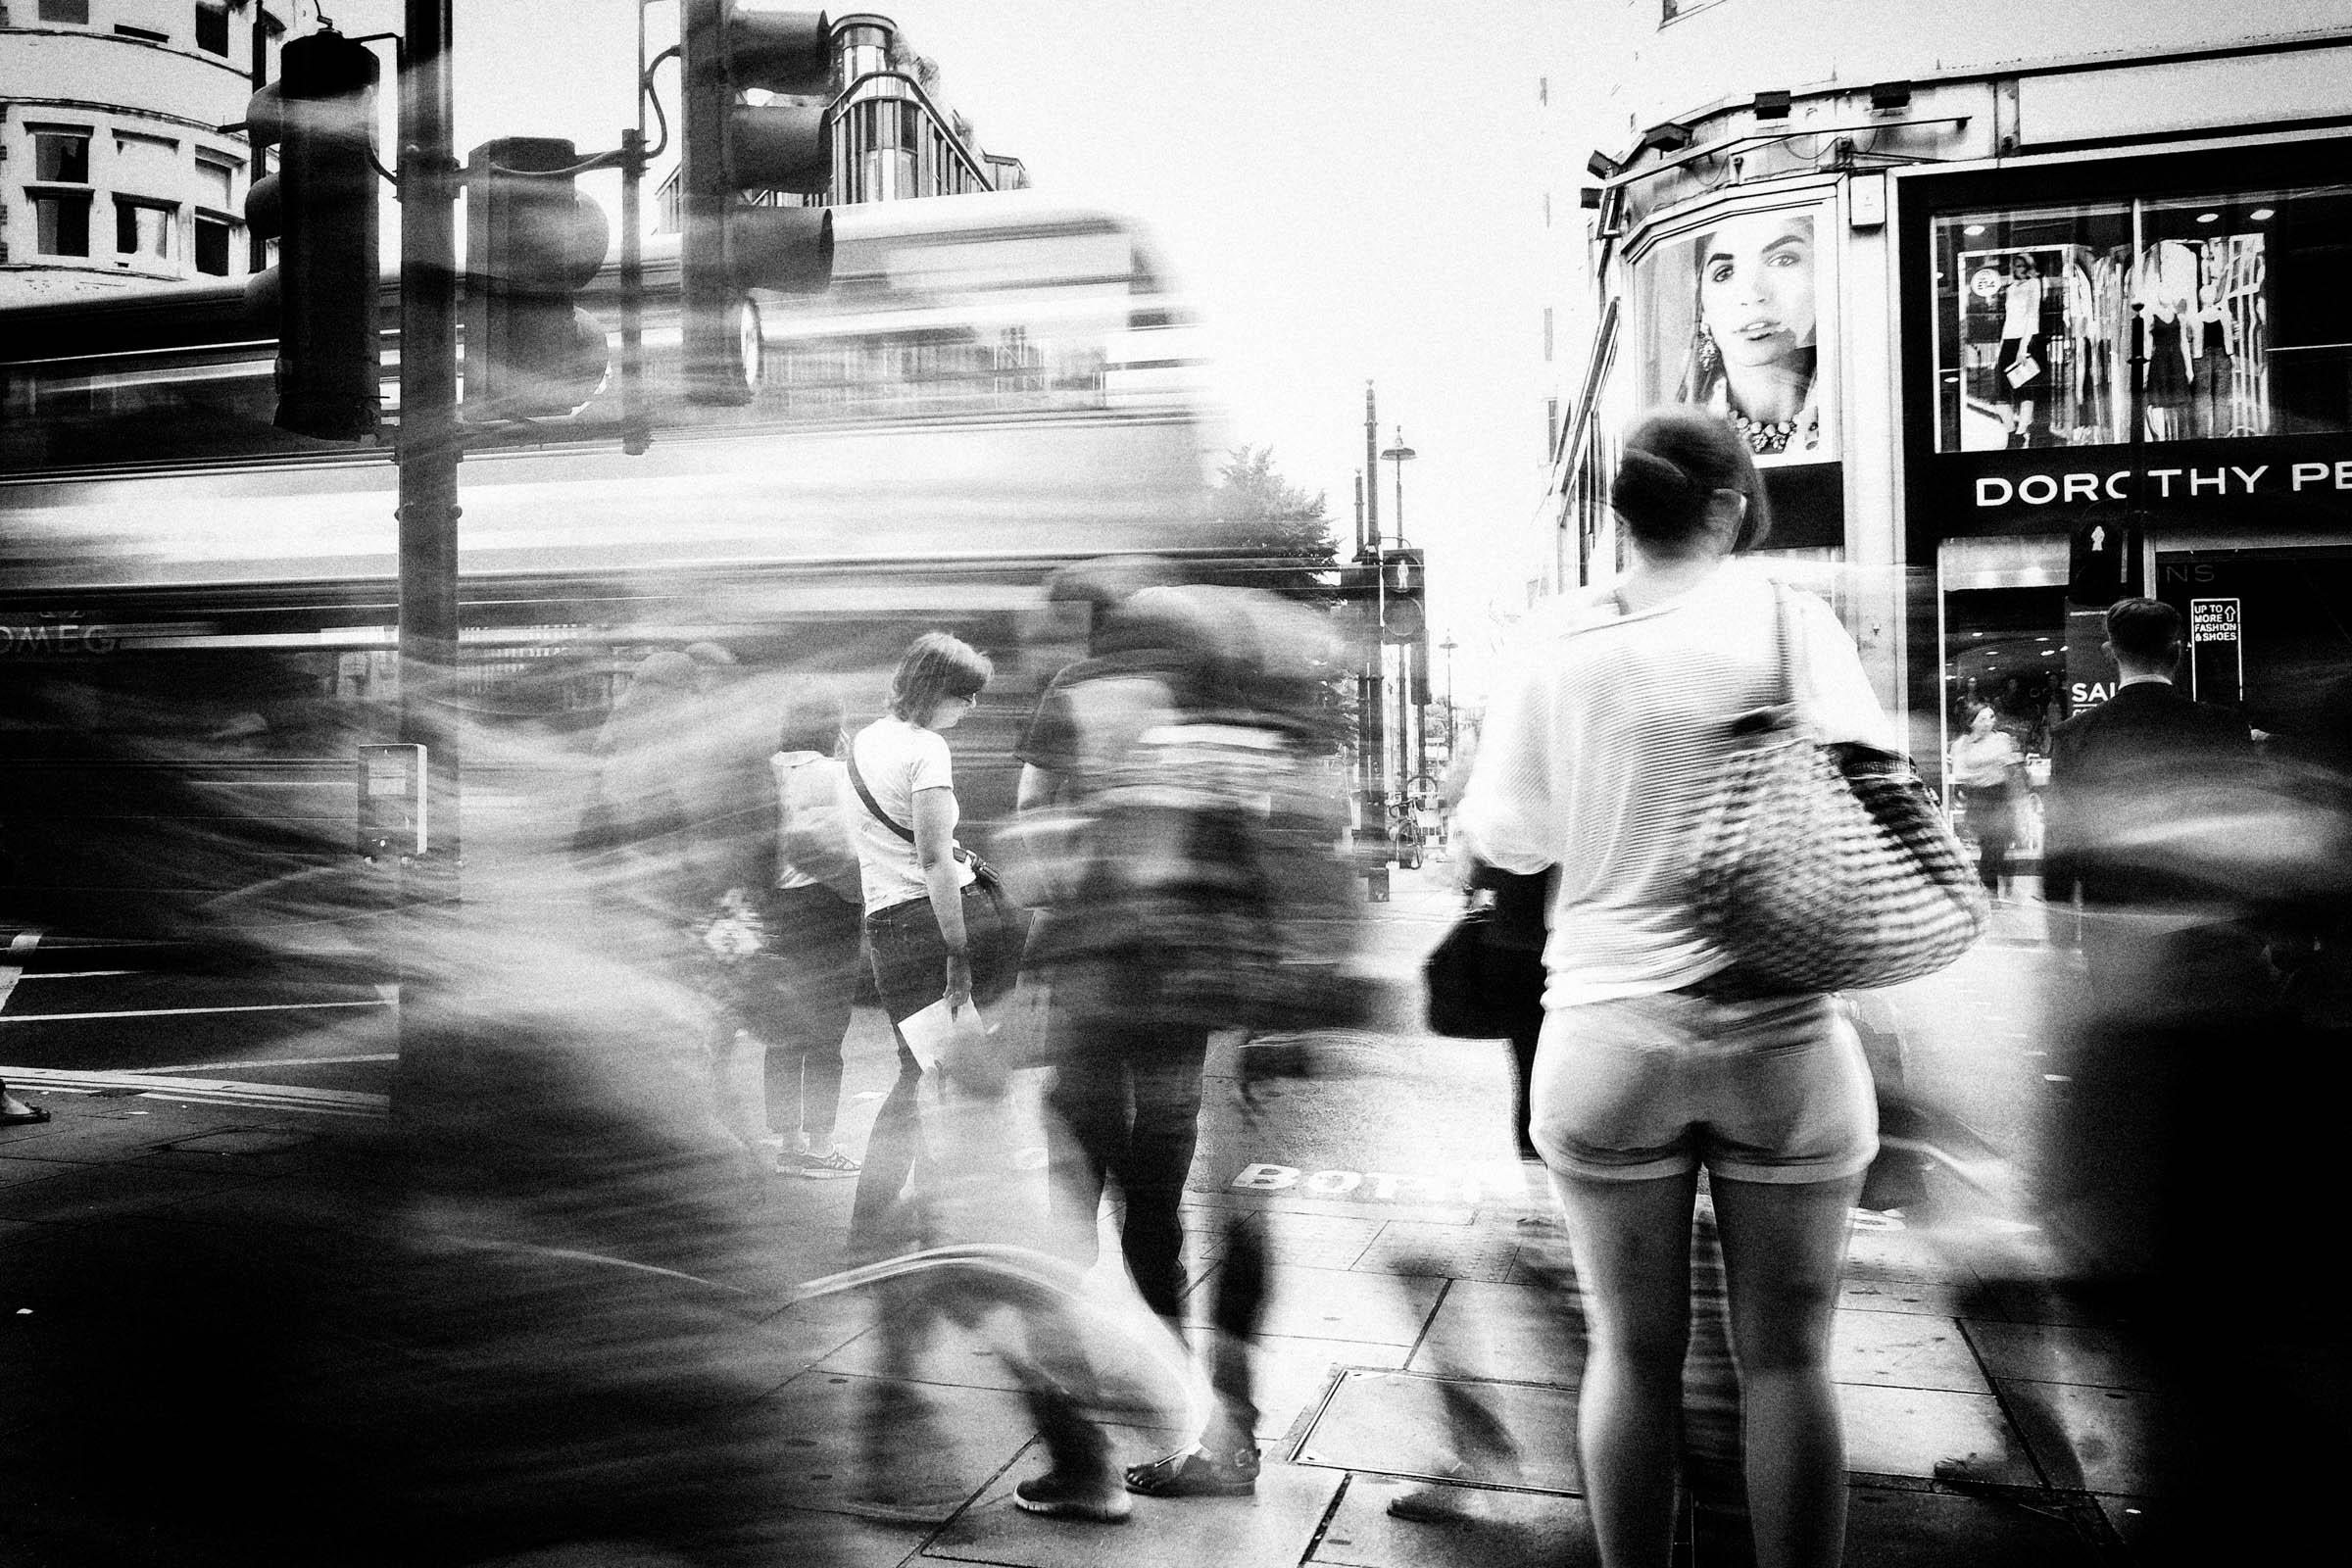 London shoppers (2014)